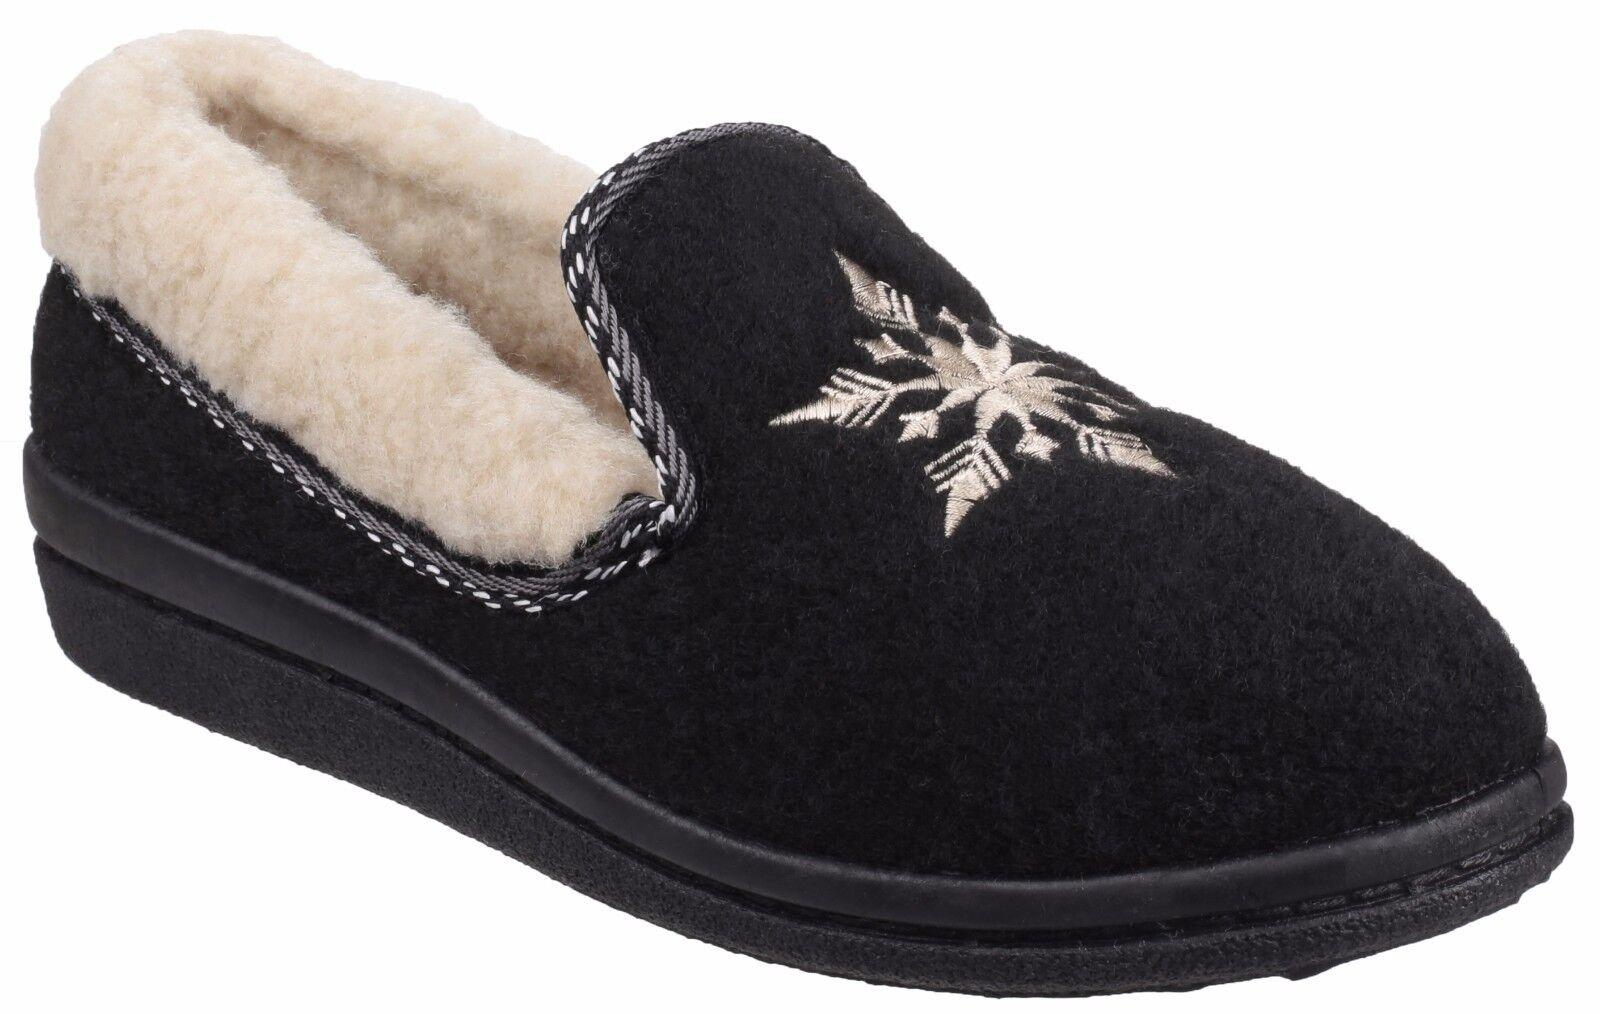 Mirak Ladies Slip on Warm Lined Slippers Style Snowflake Colour Various sz 36/41